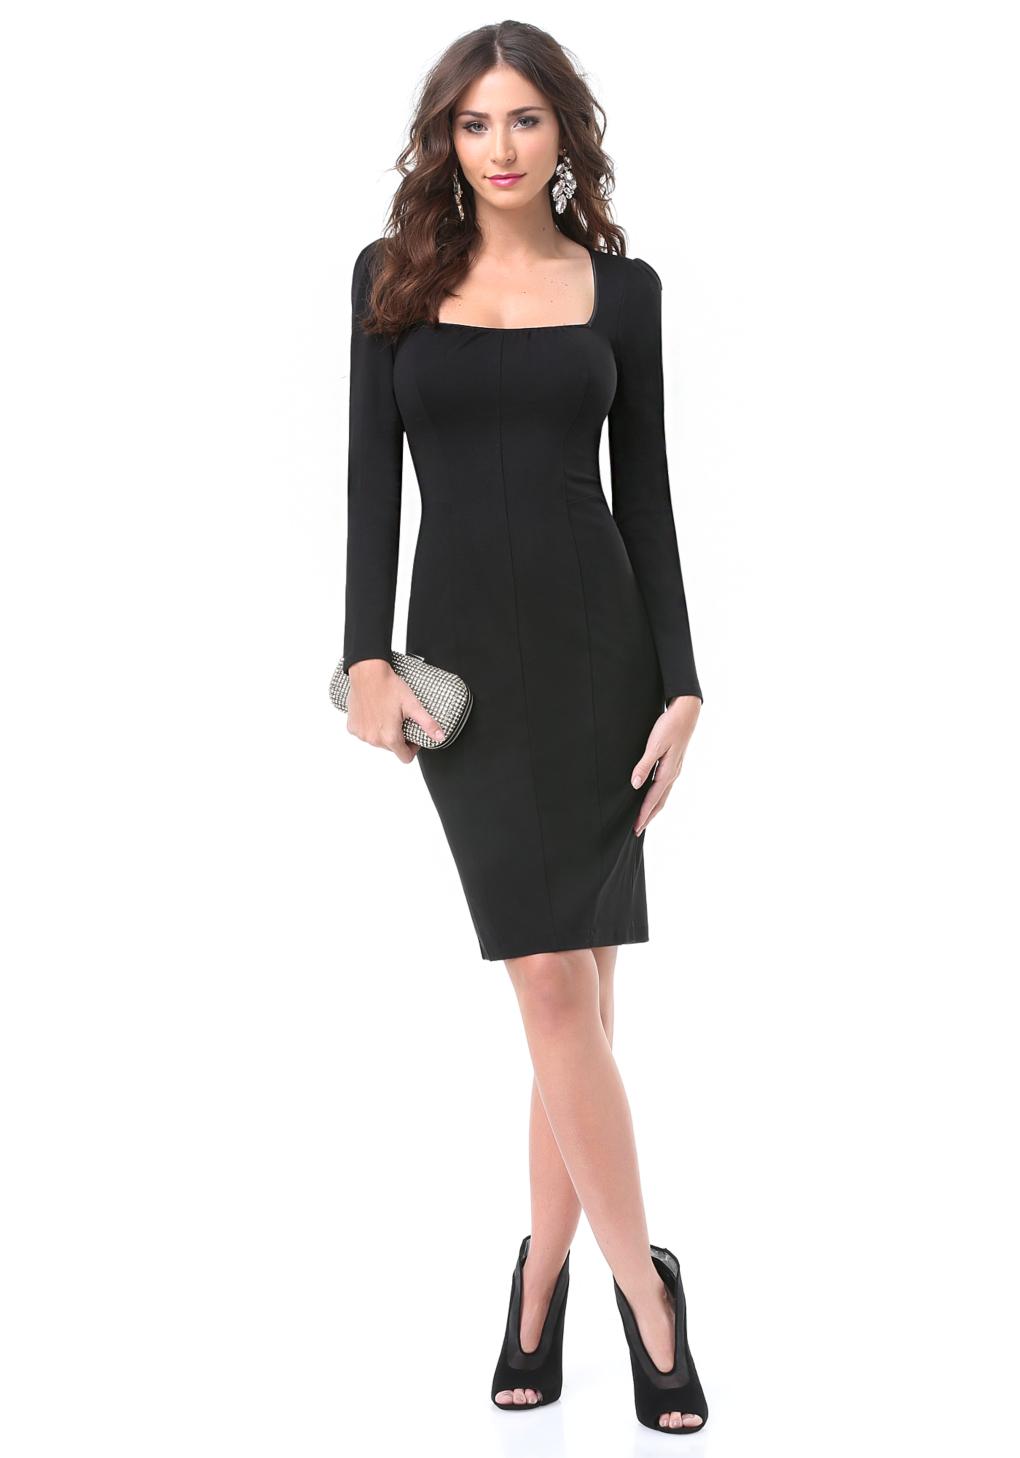 Dress Square Double Thai 100 Viscose: Bebe Reyna Square Neck Dress In Black